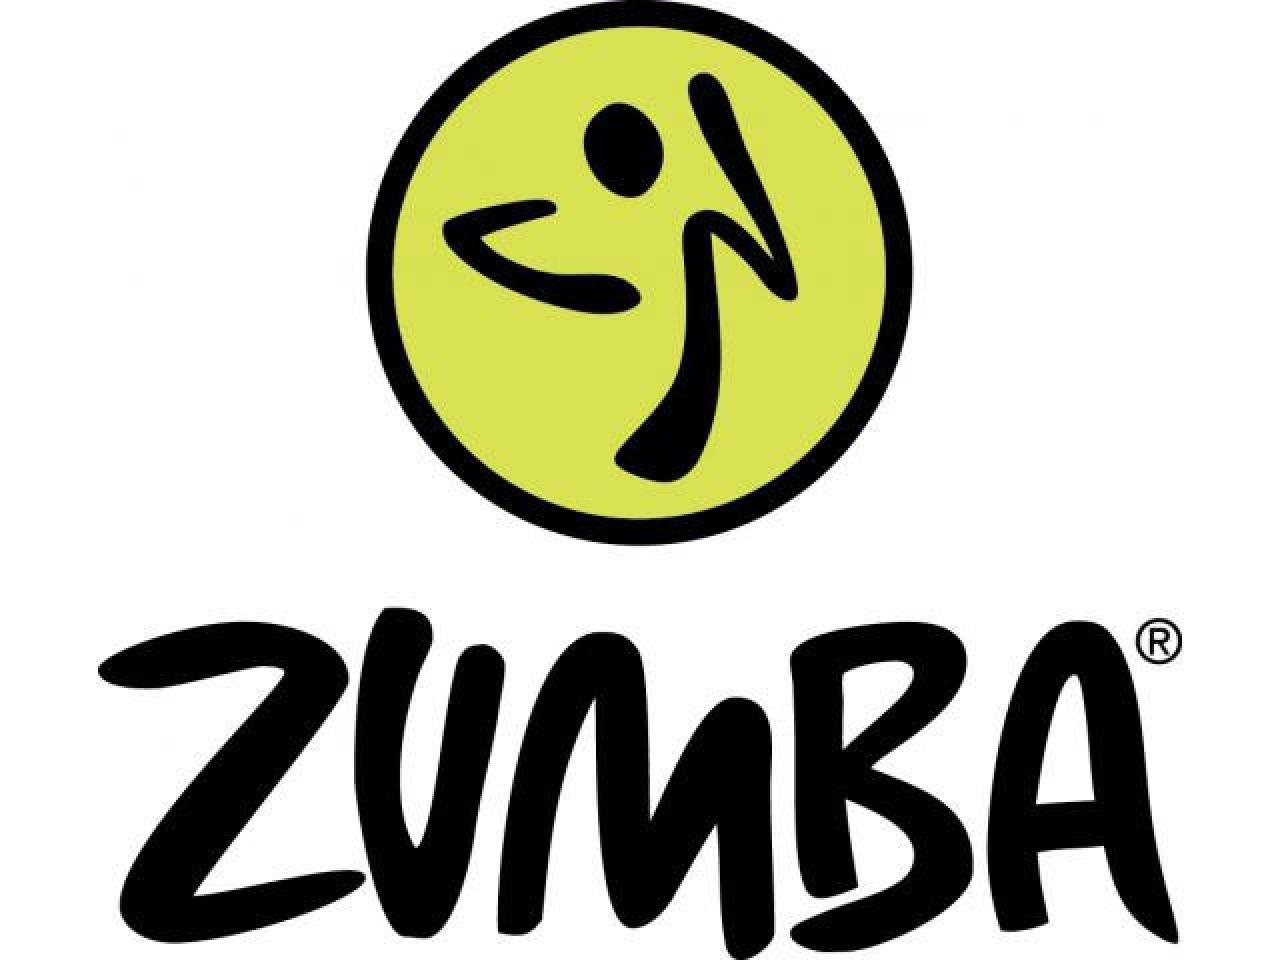 Zumba fitness - 1